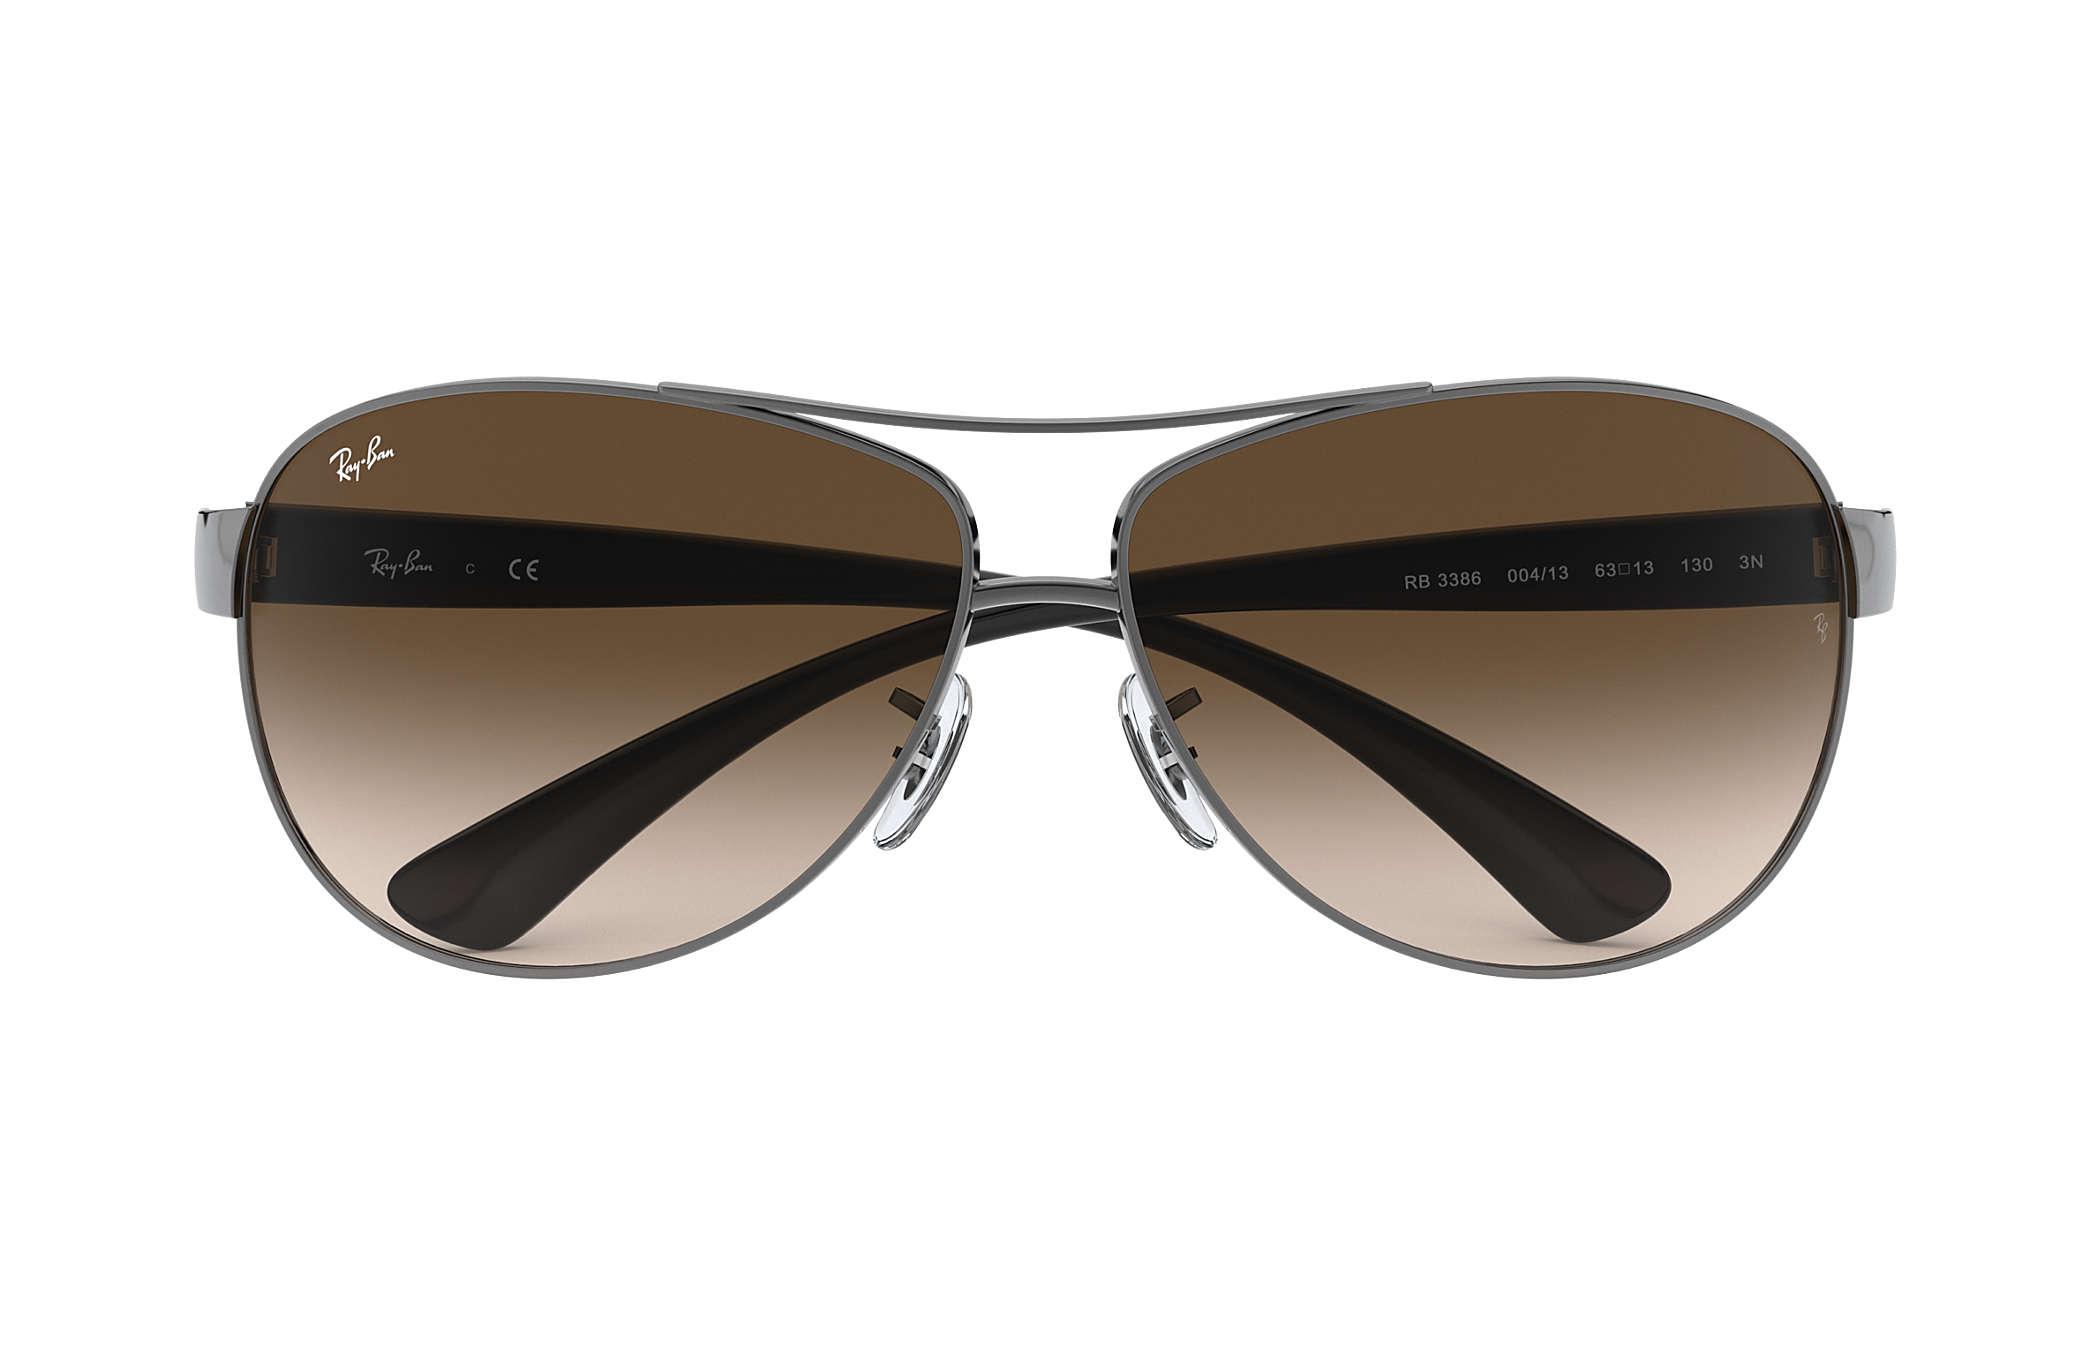 Ray Ban Rb3386 Gunmetal Metal Brown Lenses 0rb3386004 1363 Kacamata Oem Gb001 Black 0rb3386 Sun